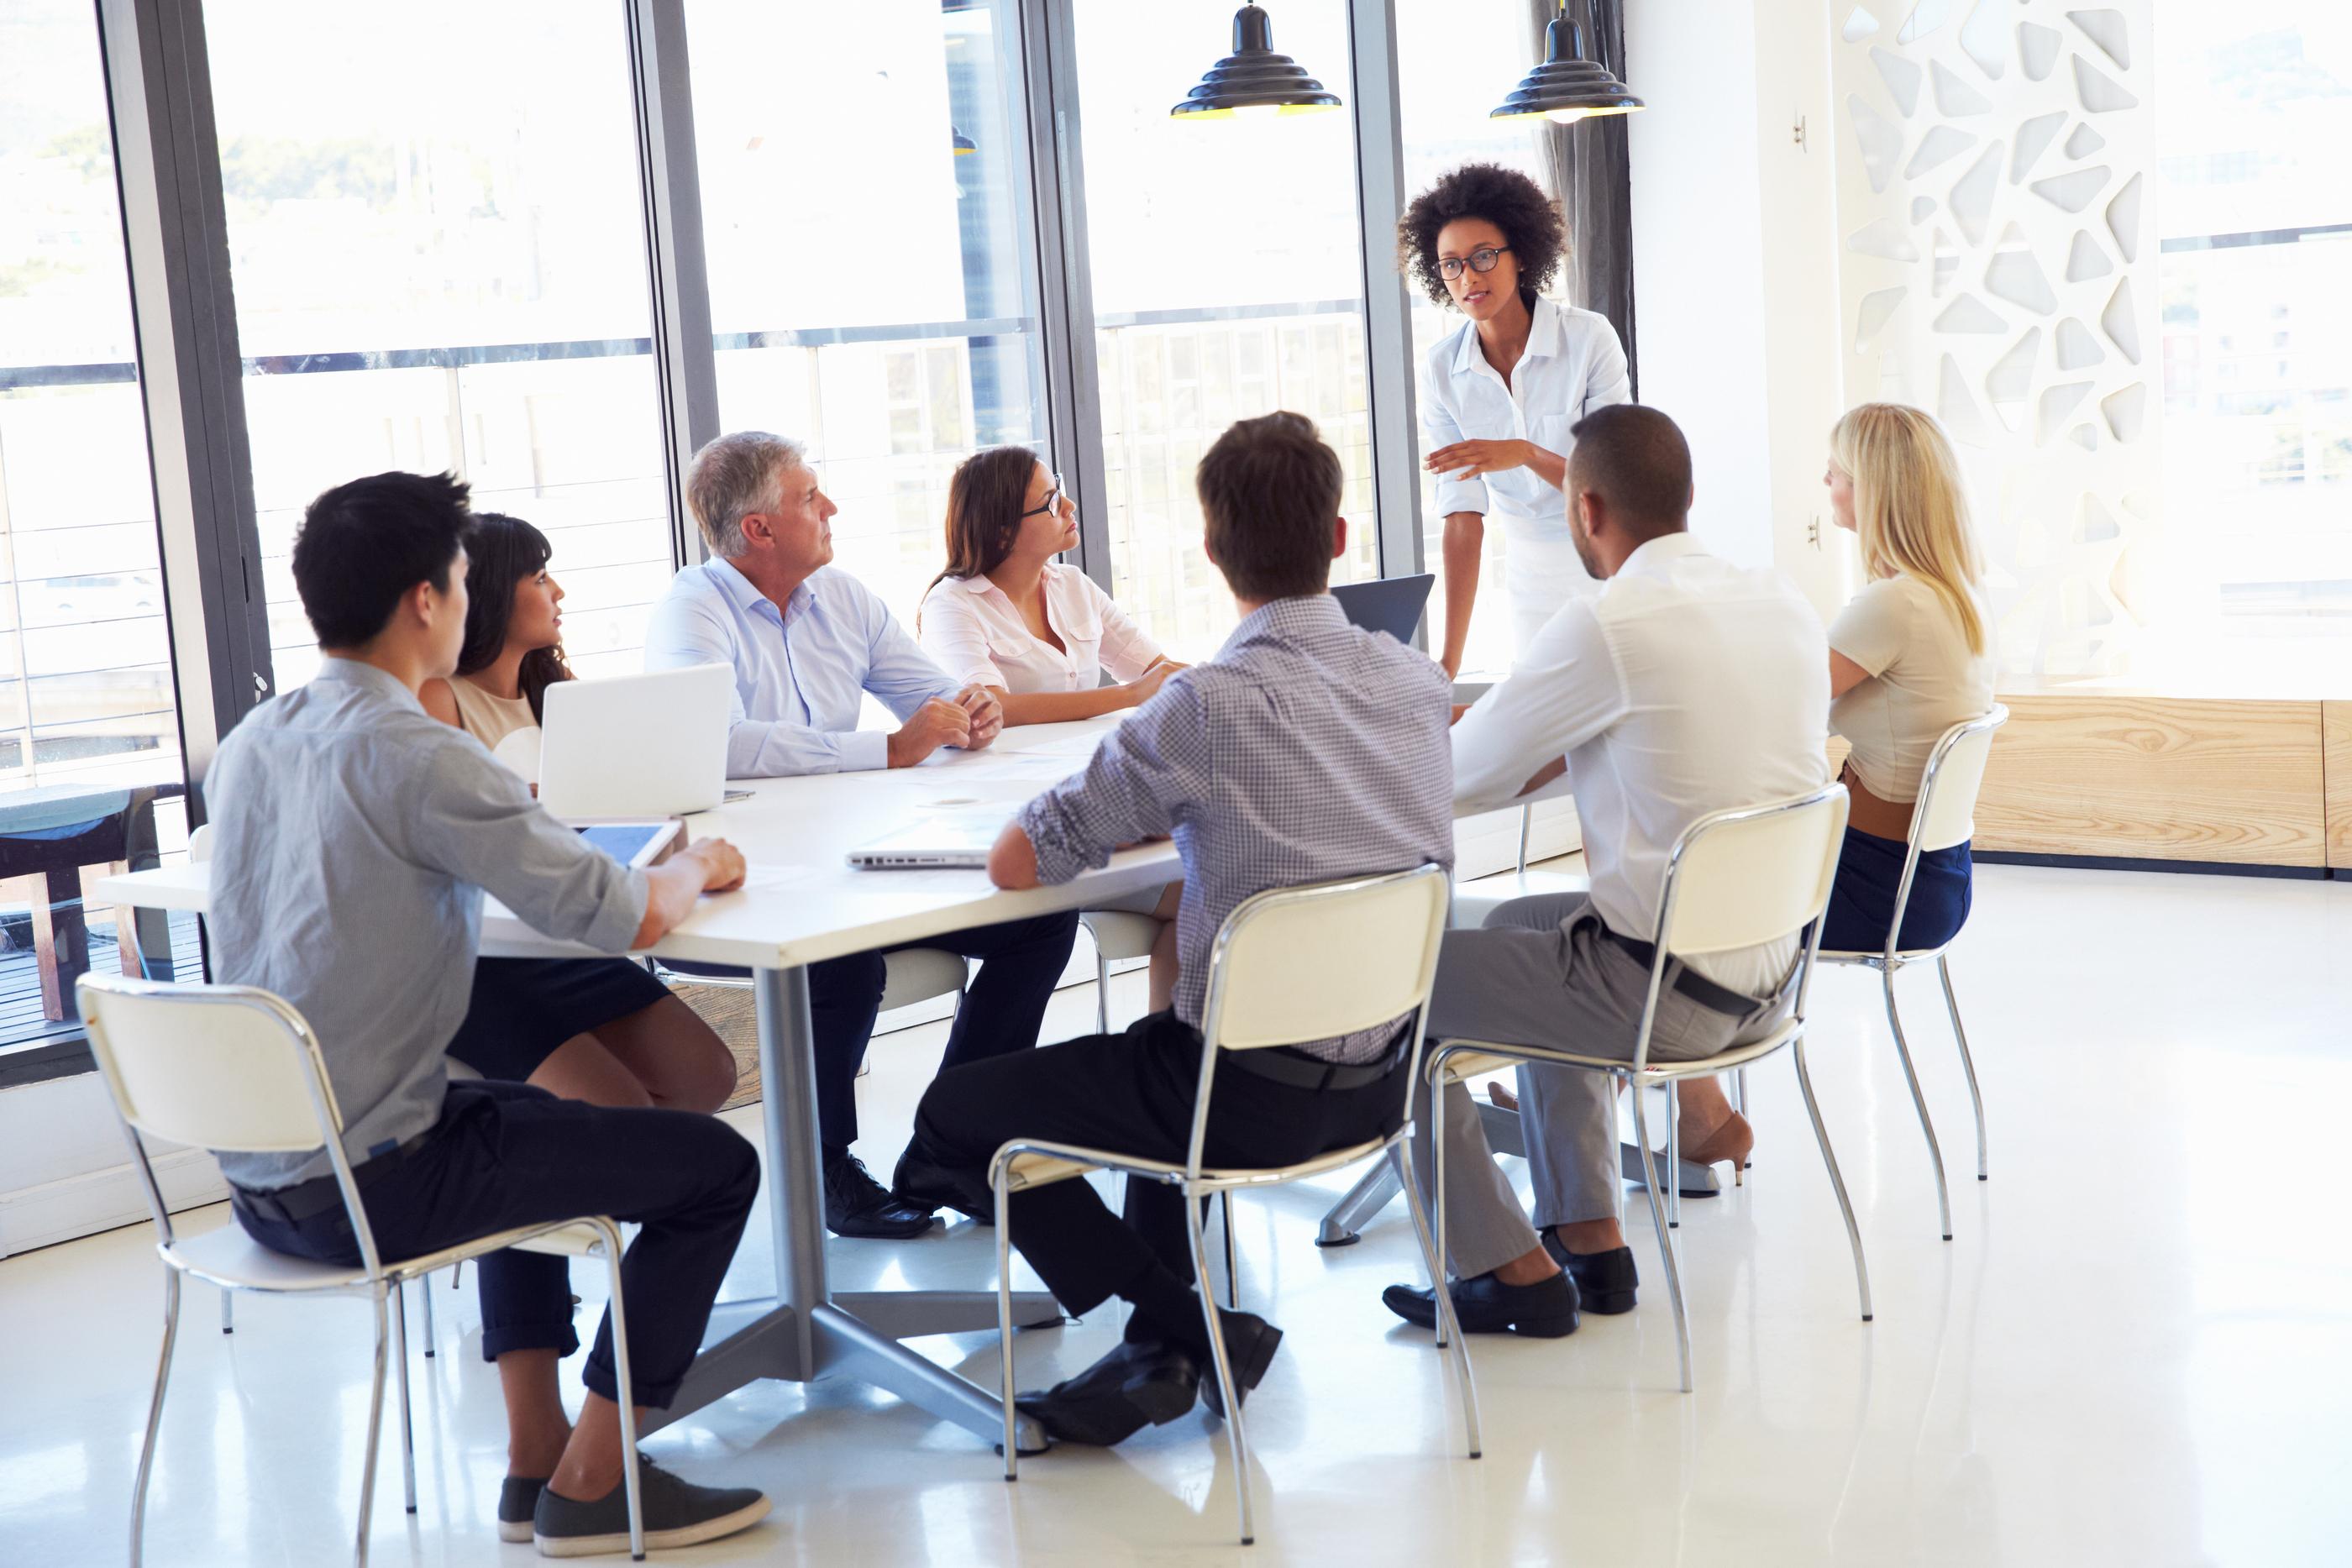 bigstock-Businesswoman-presenting-to-co-90005828